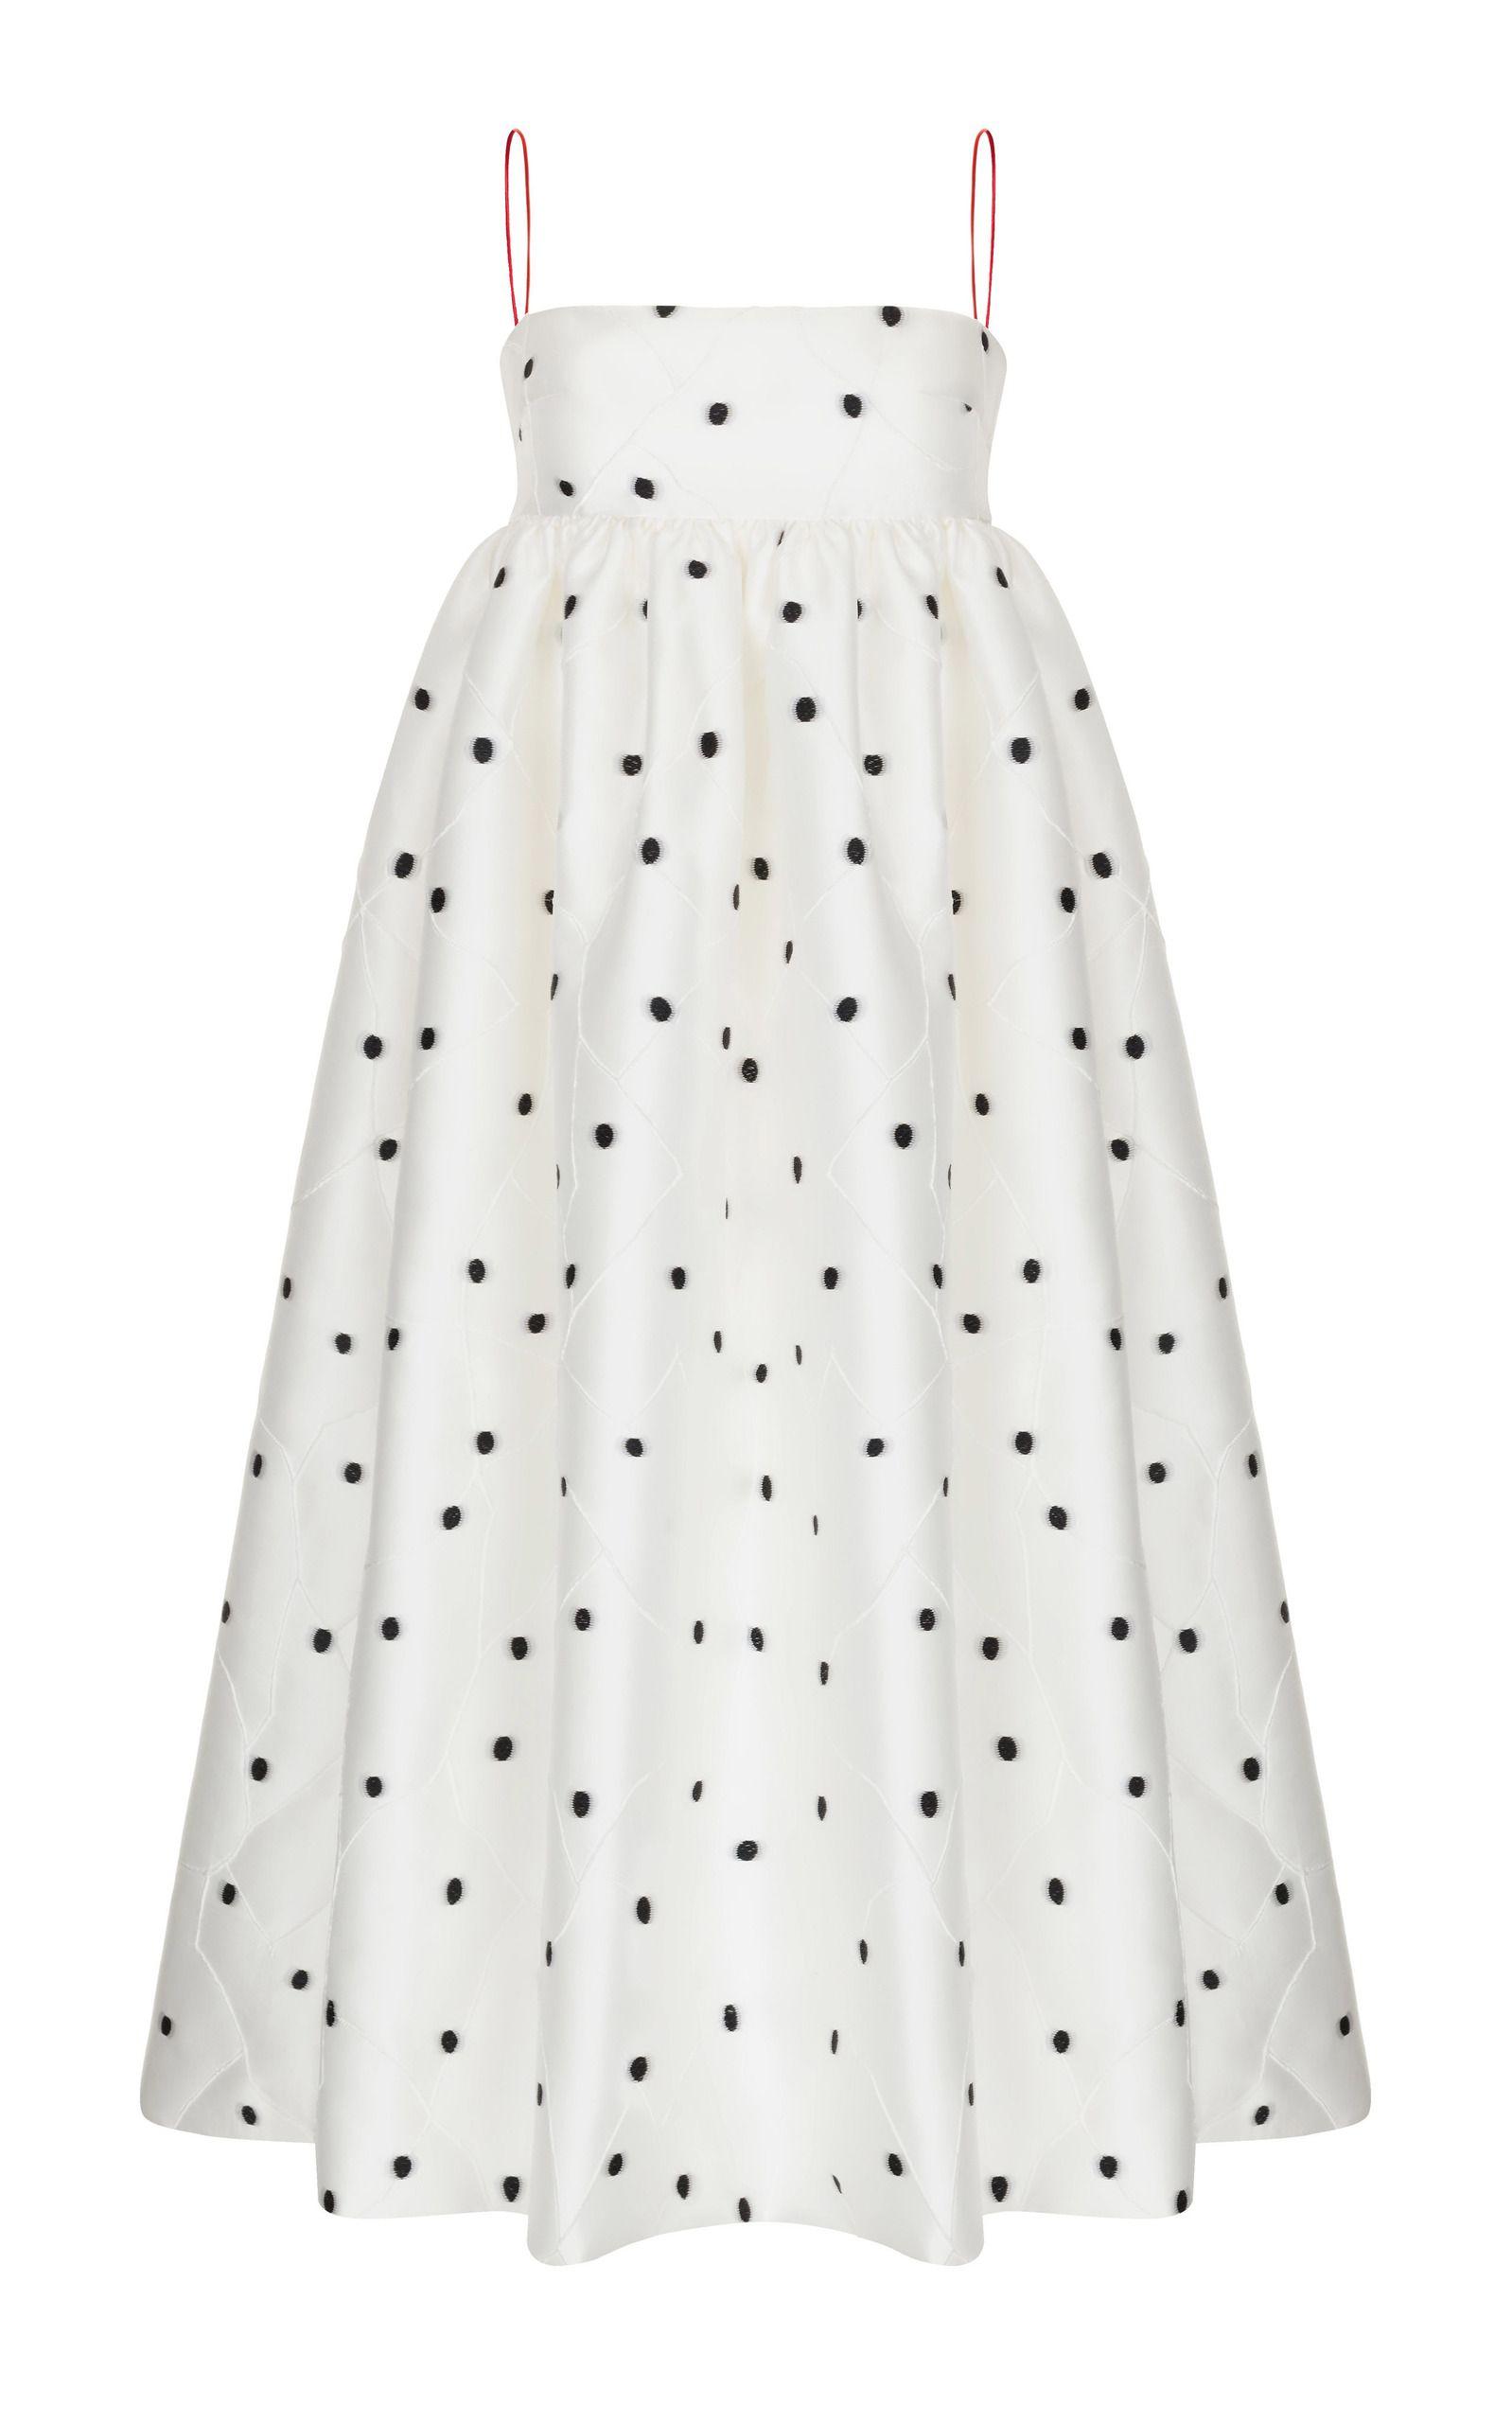 bcc9f3561 Jacquard Dress With Voluminous Skirt by RASARIO for Preorder on Moda  Operandi